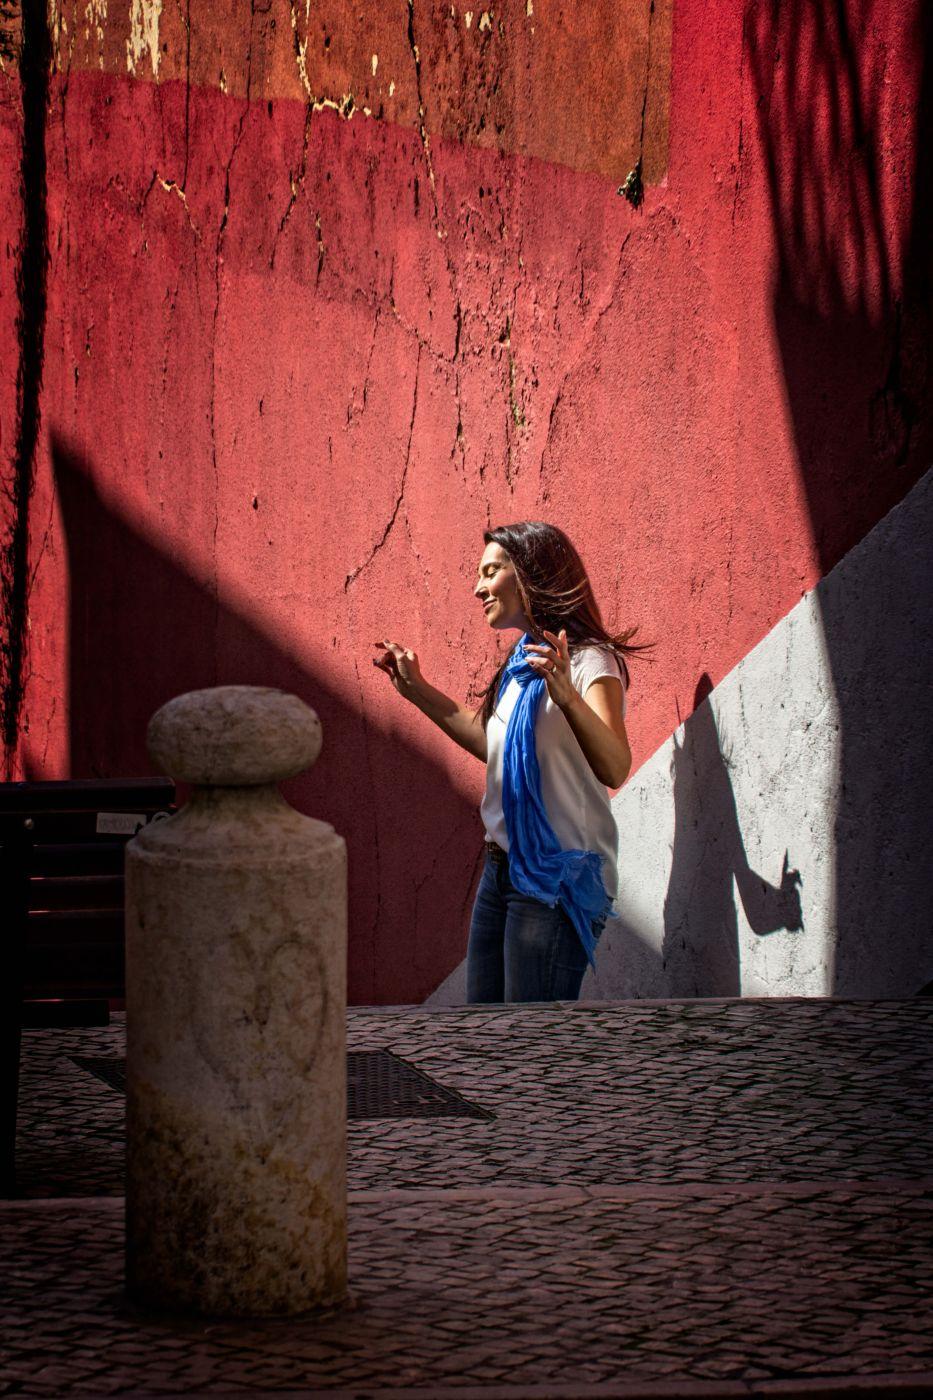 Practicing the Fado, Portugal